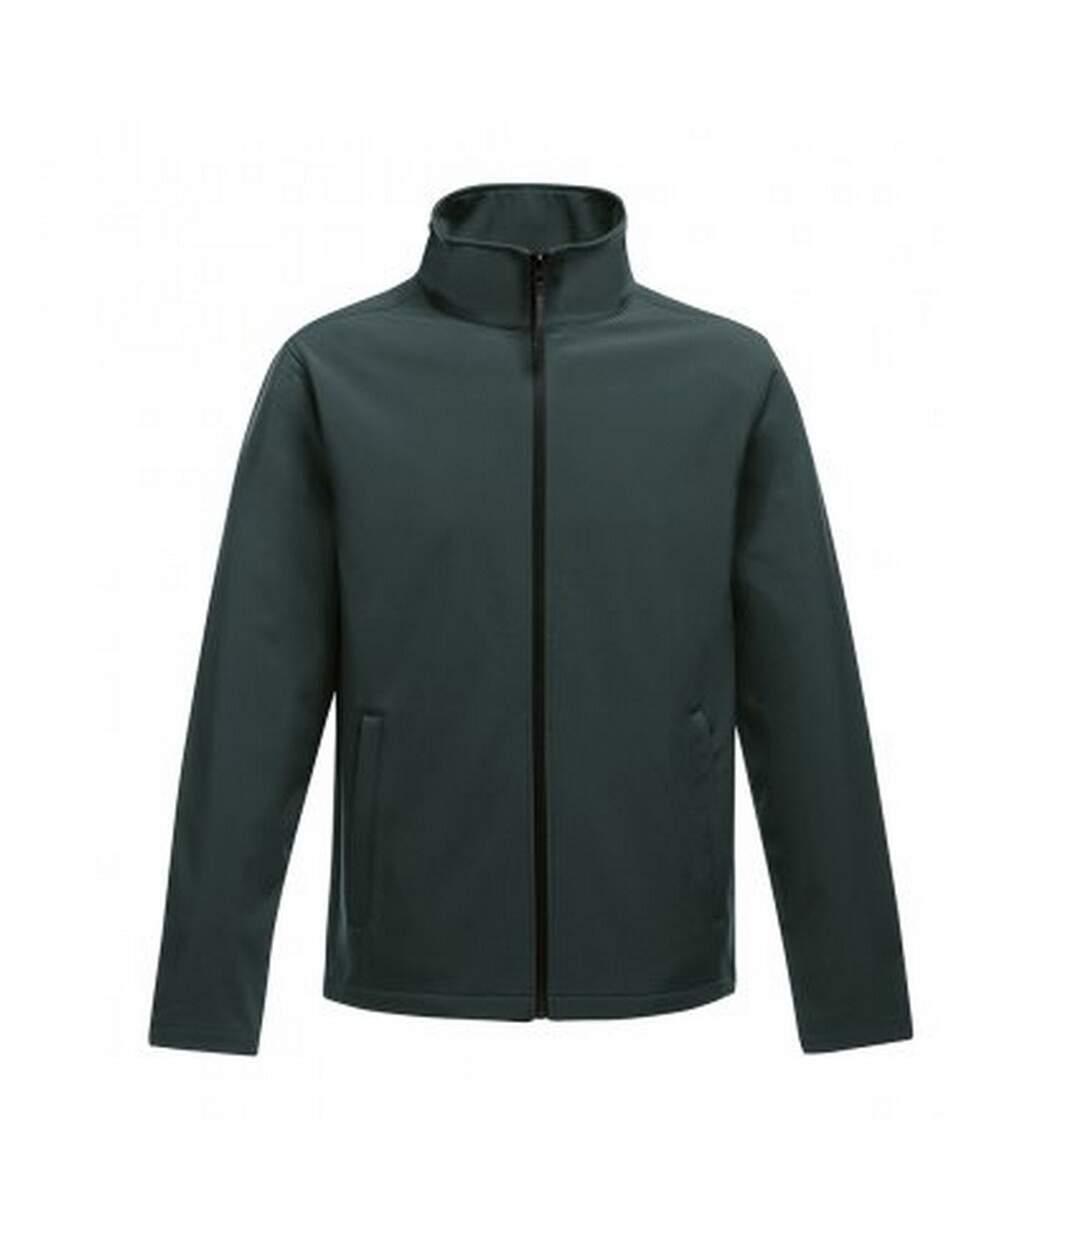 Regatta Standout Mens Ablaze Printable Soft Shell Jacket (Dark Spruce/Black) - UTPC3322